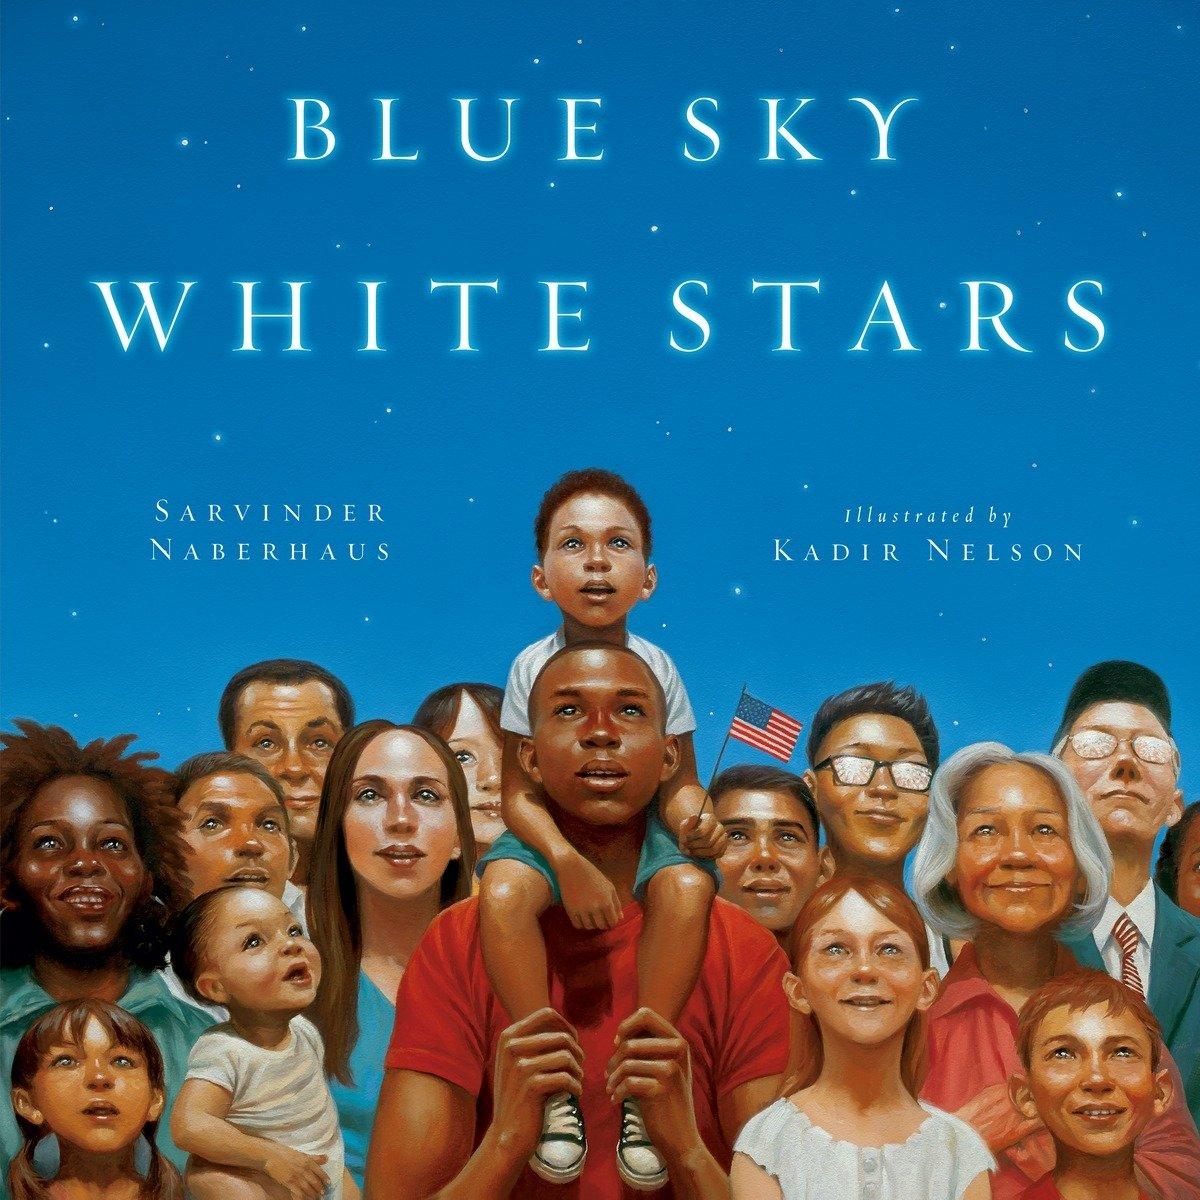 Blue Sky White Stars by Sarvinder Naberhaus